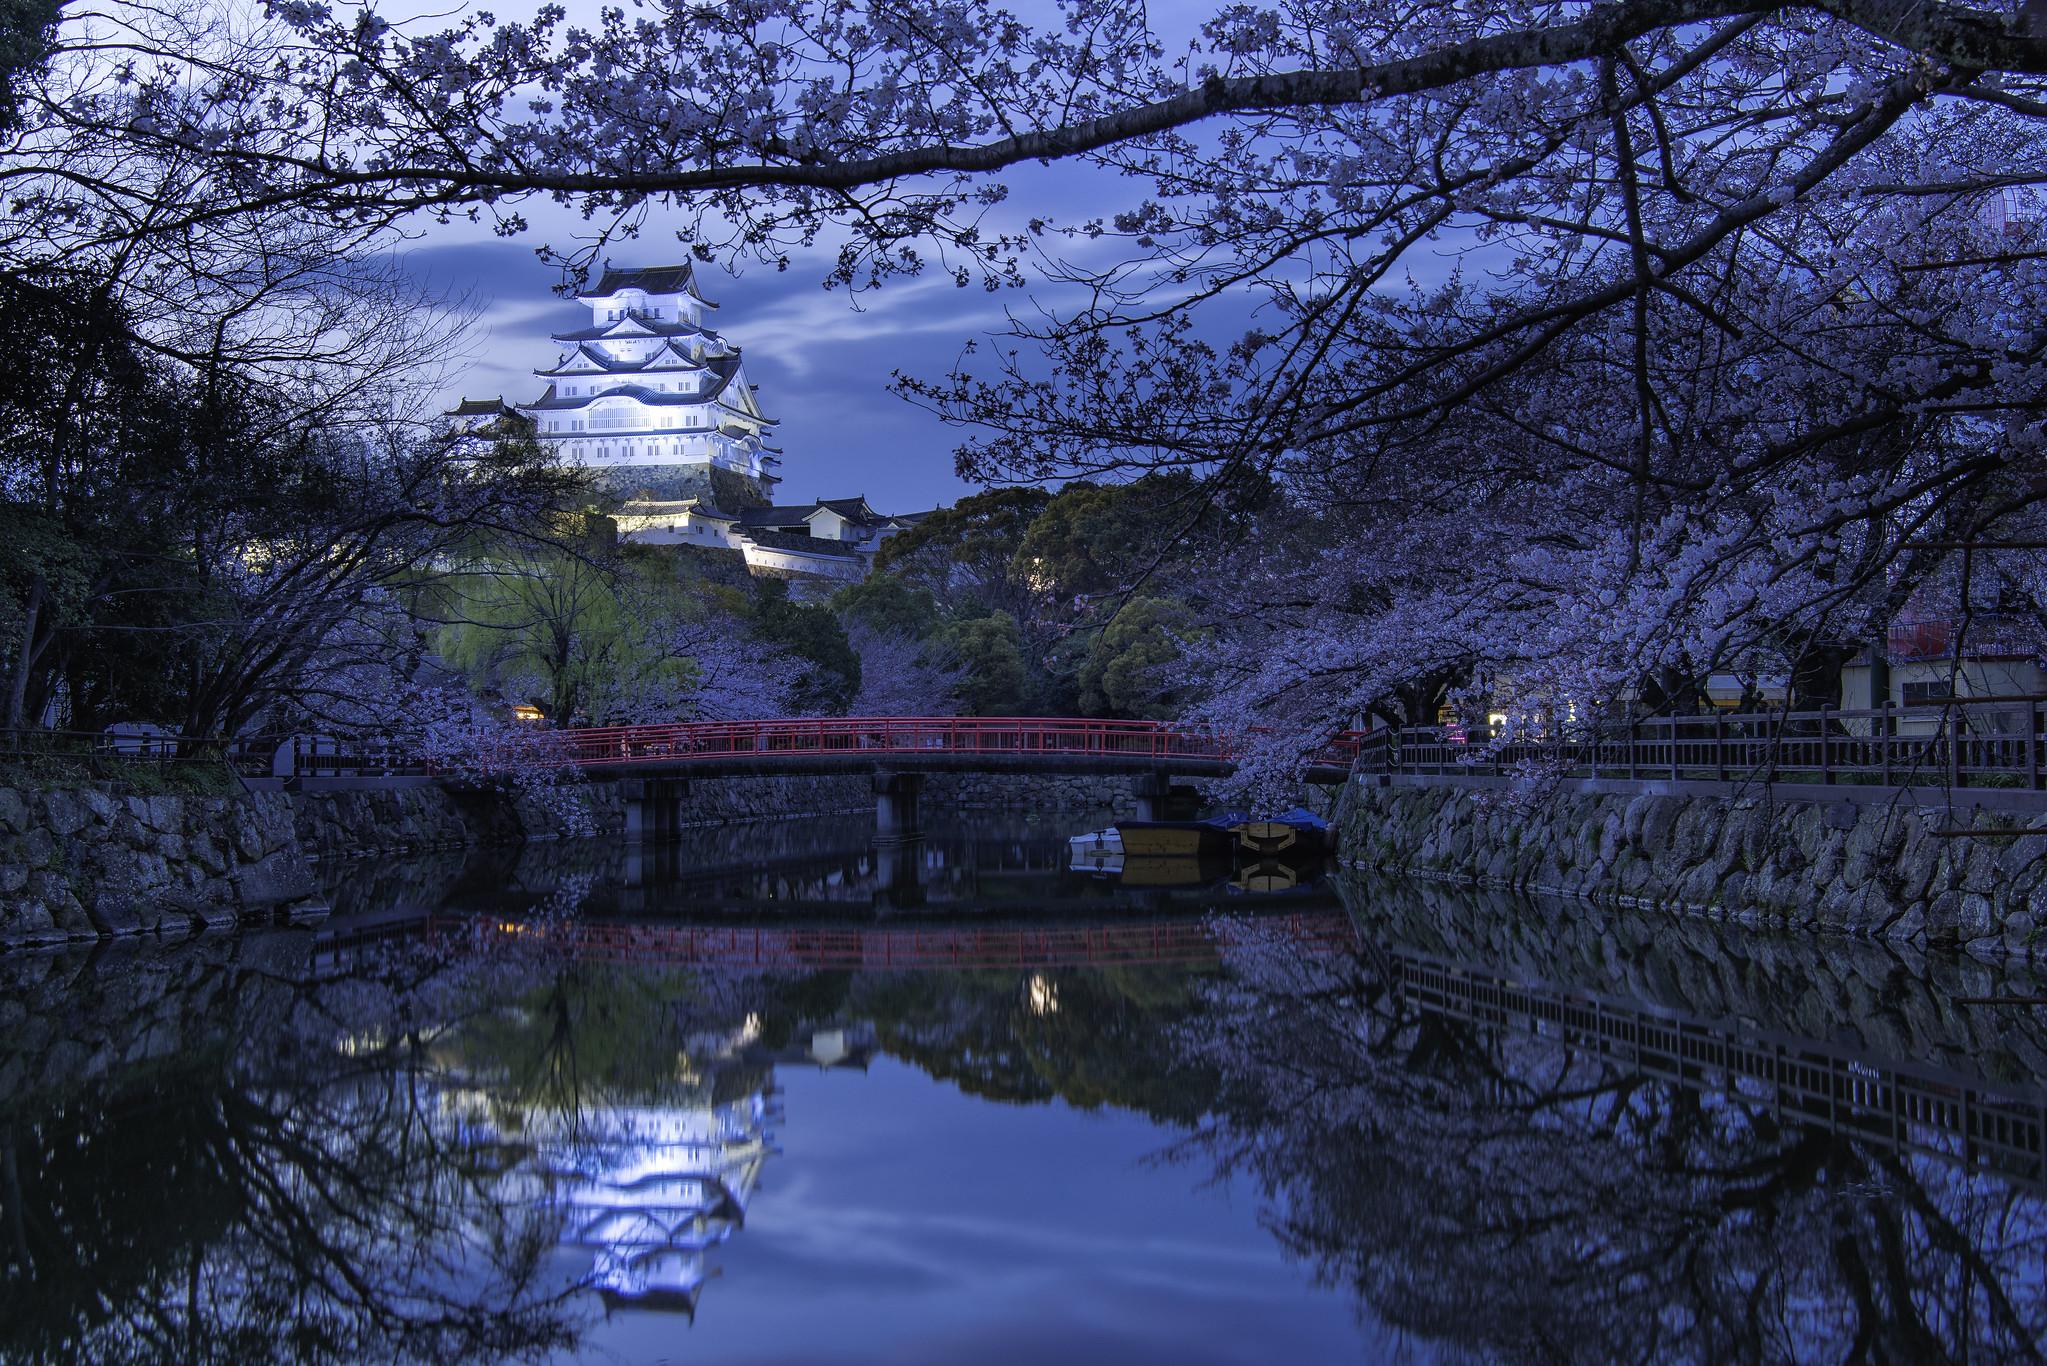 Cherry Blossom Dreams - Himeji Castle (Japan)